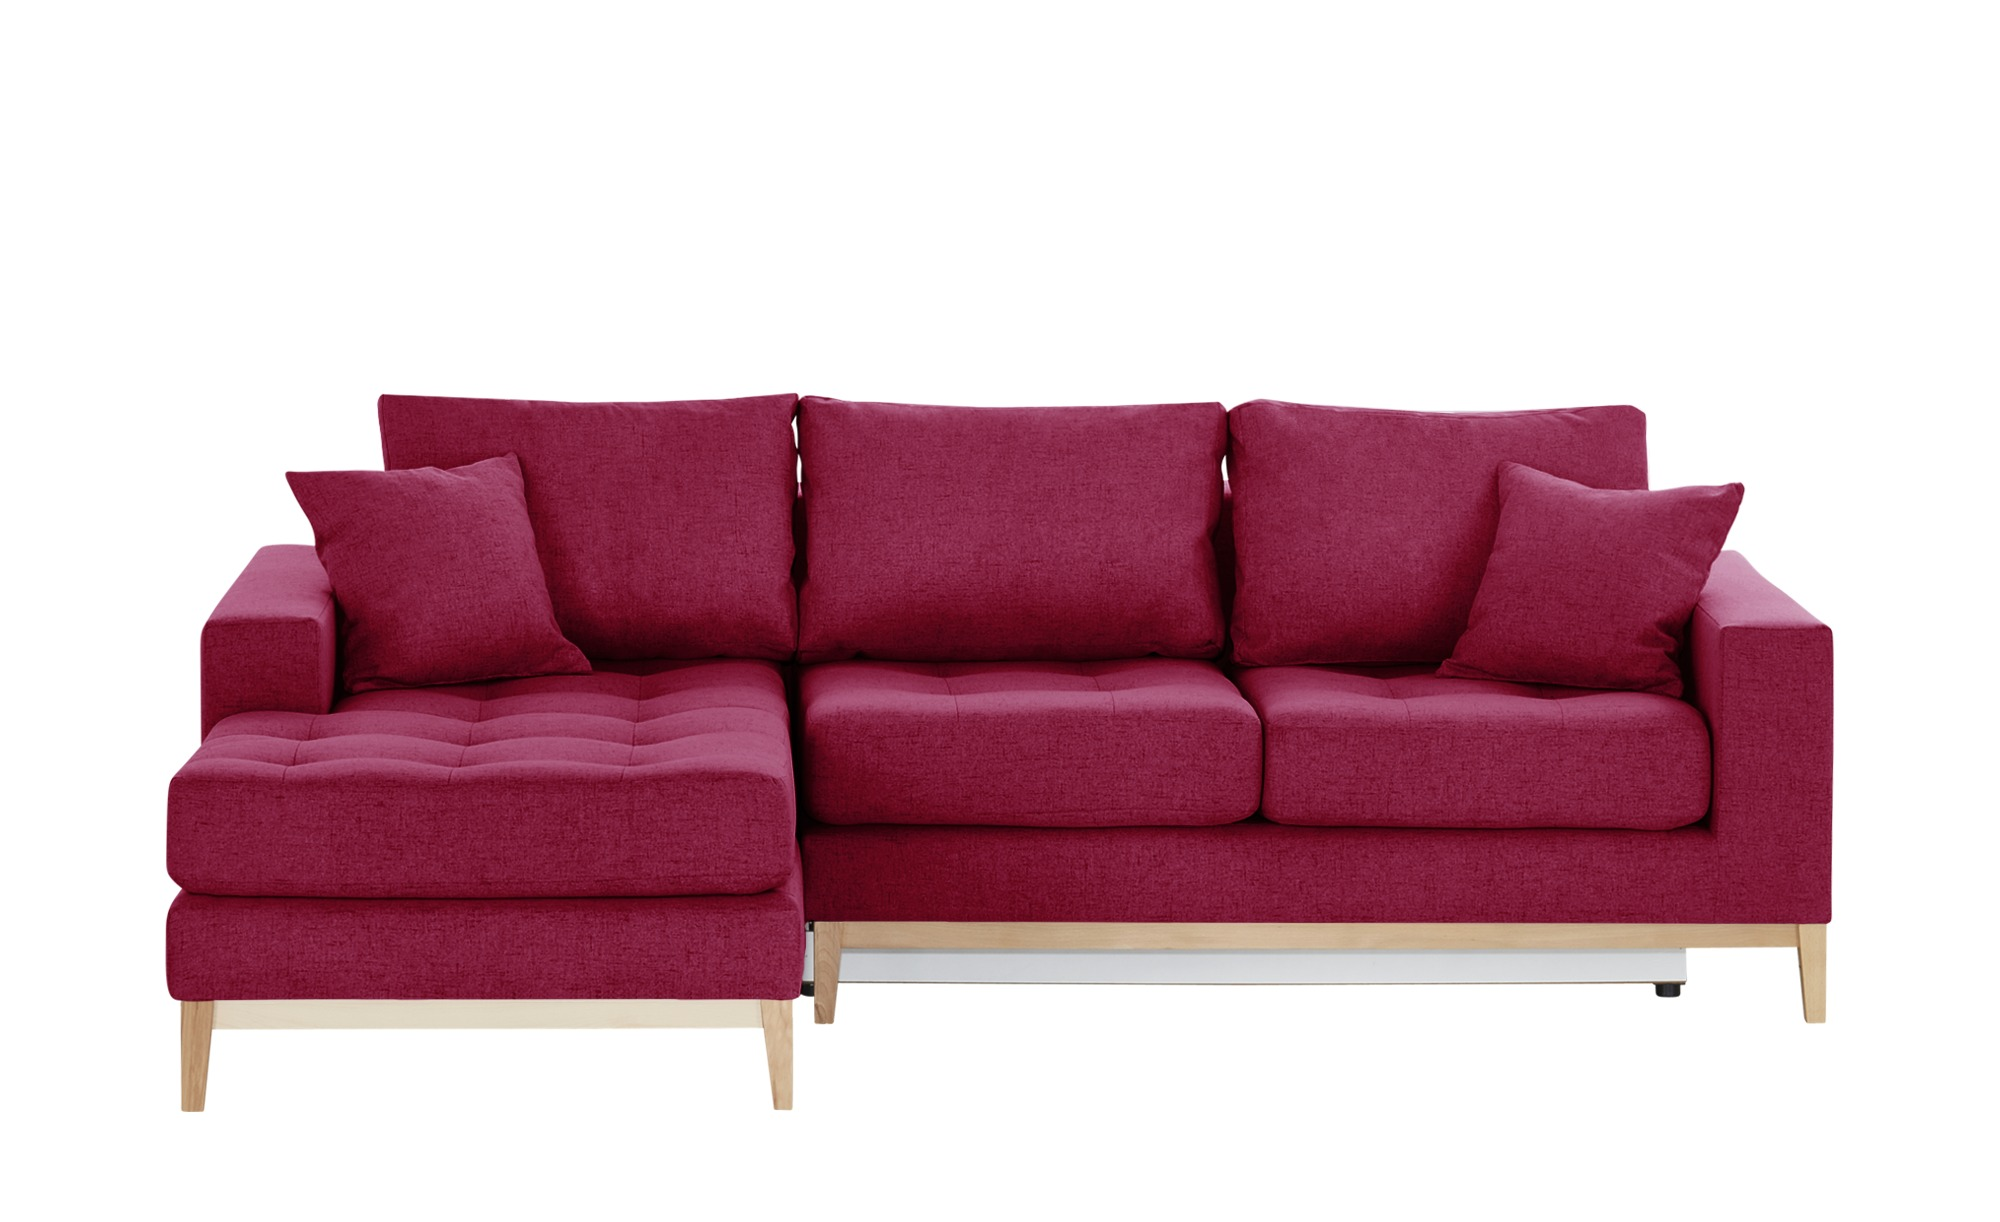 Smart ecksofa vivien breite h he 90 cm rot online kaufen for Ecksofa 1 90